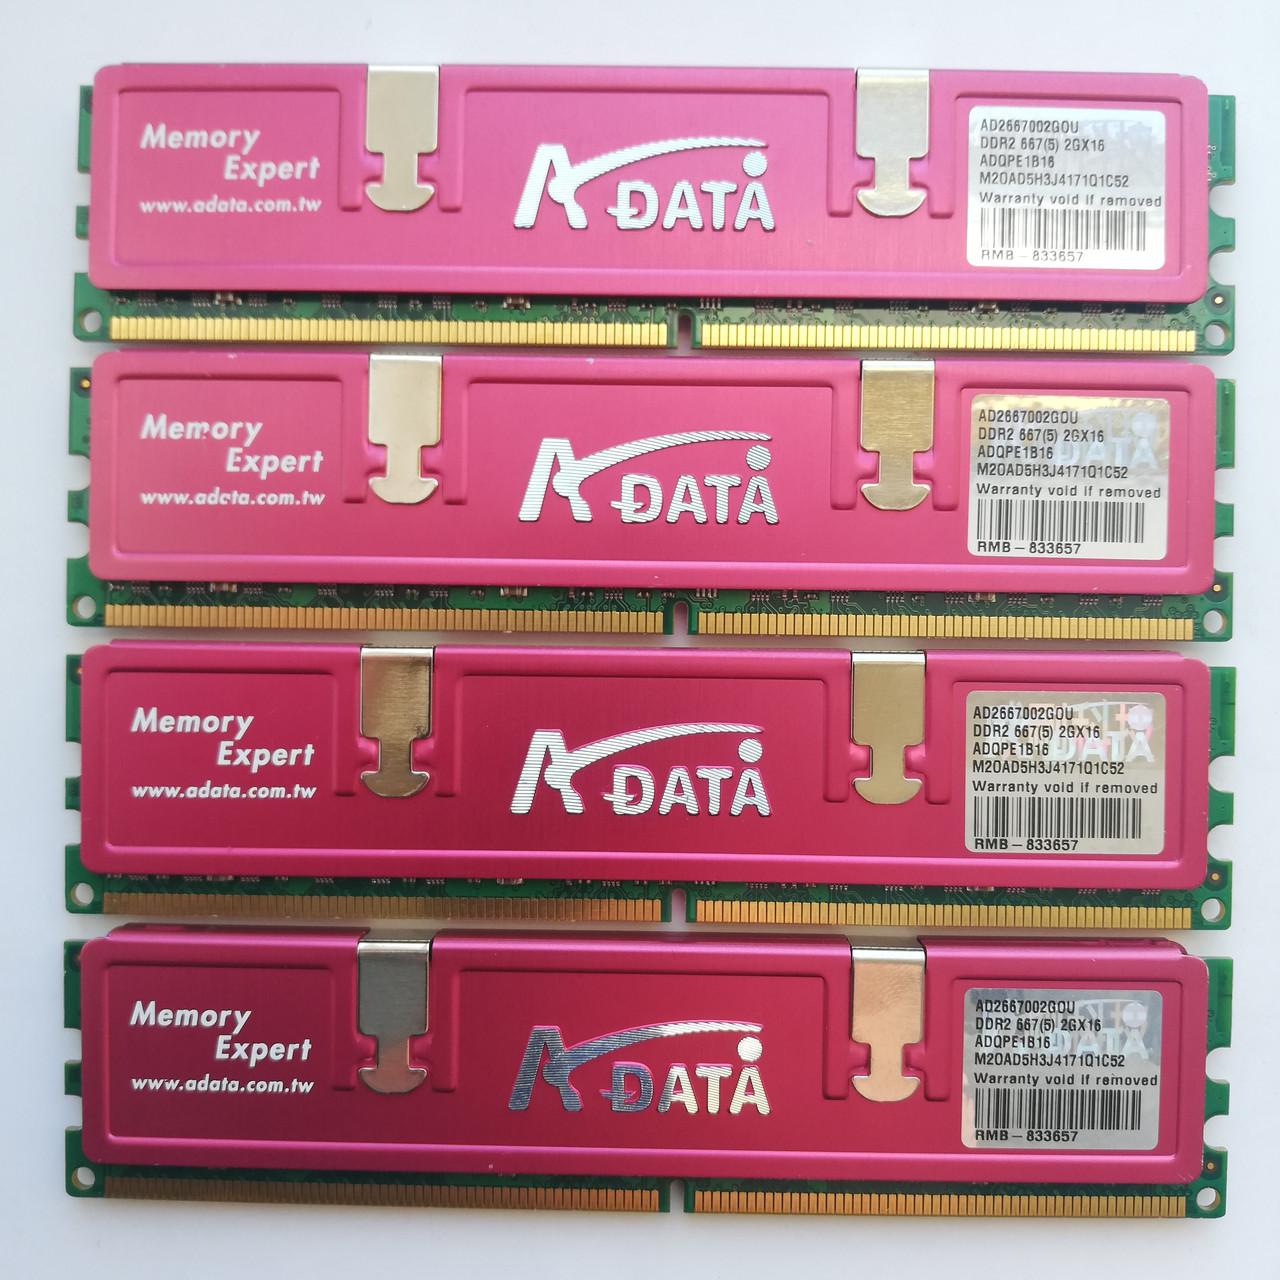 Комплект оперативной памяти Adata DDR2 8Gb (4*2Gb) 667MHz PC2 5300U CL5 (AD2667002GOU) Б/У